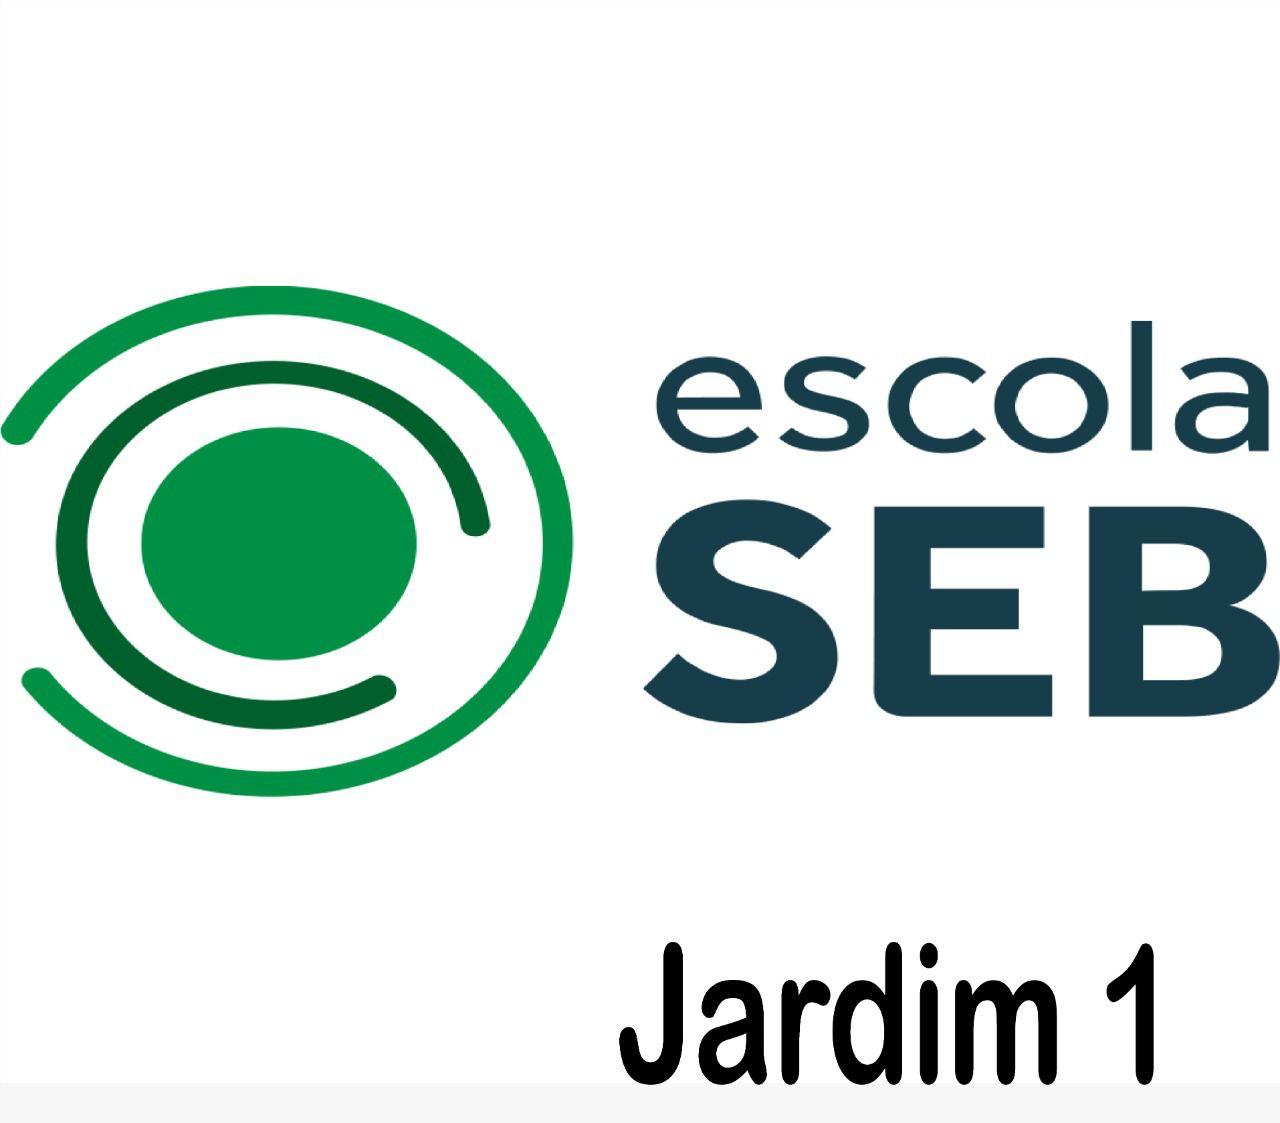 Seb Coc - Jardim 1 - 2021